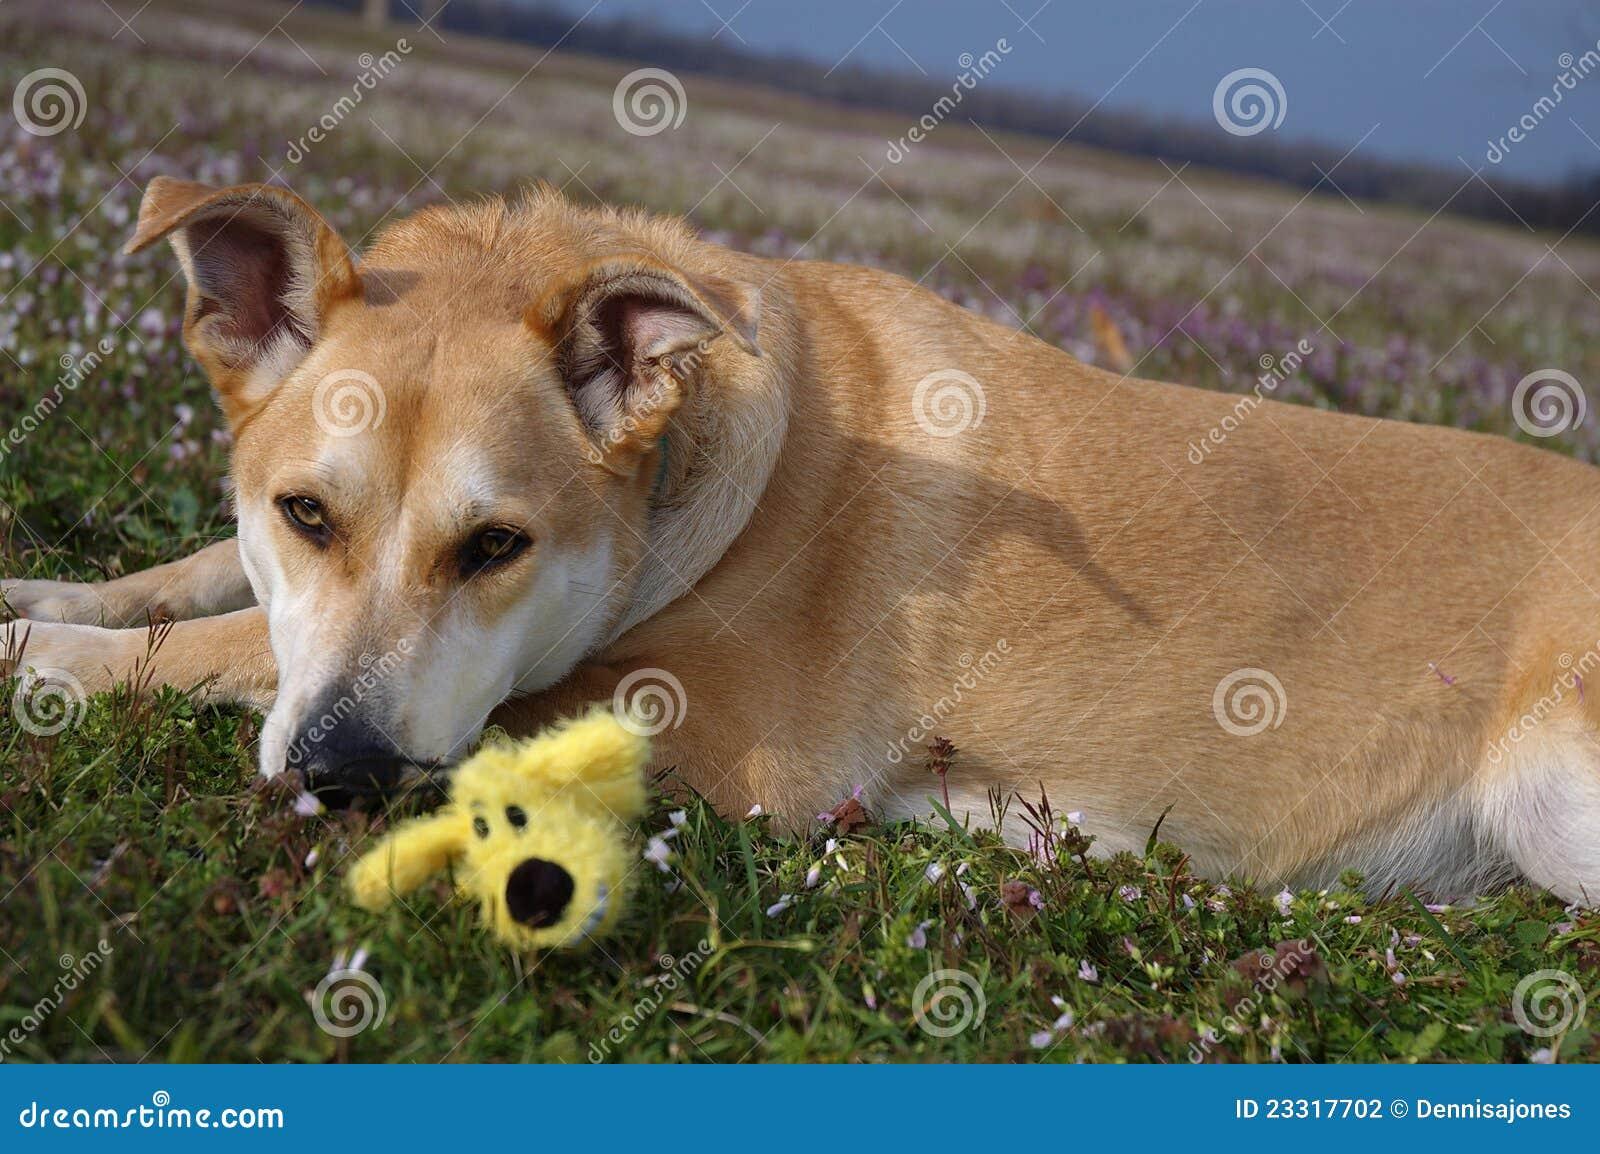 Carolina Dog Portrait In Meadow Stock Photography Image